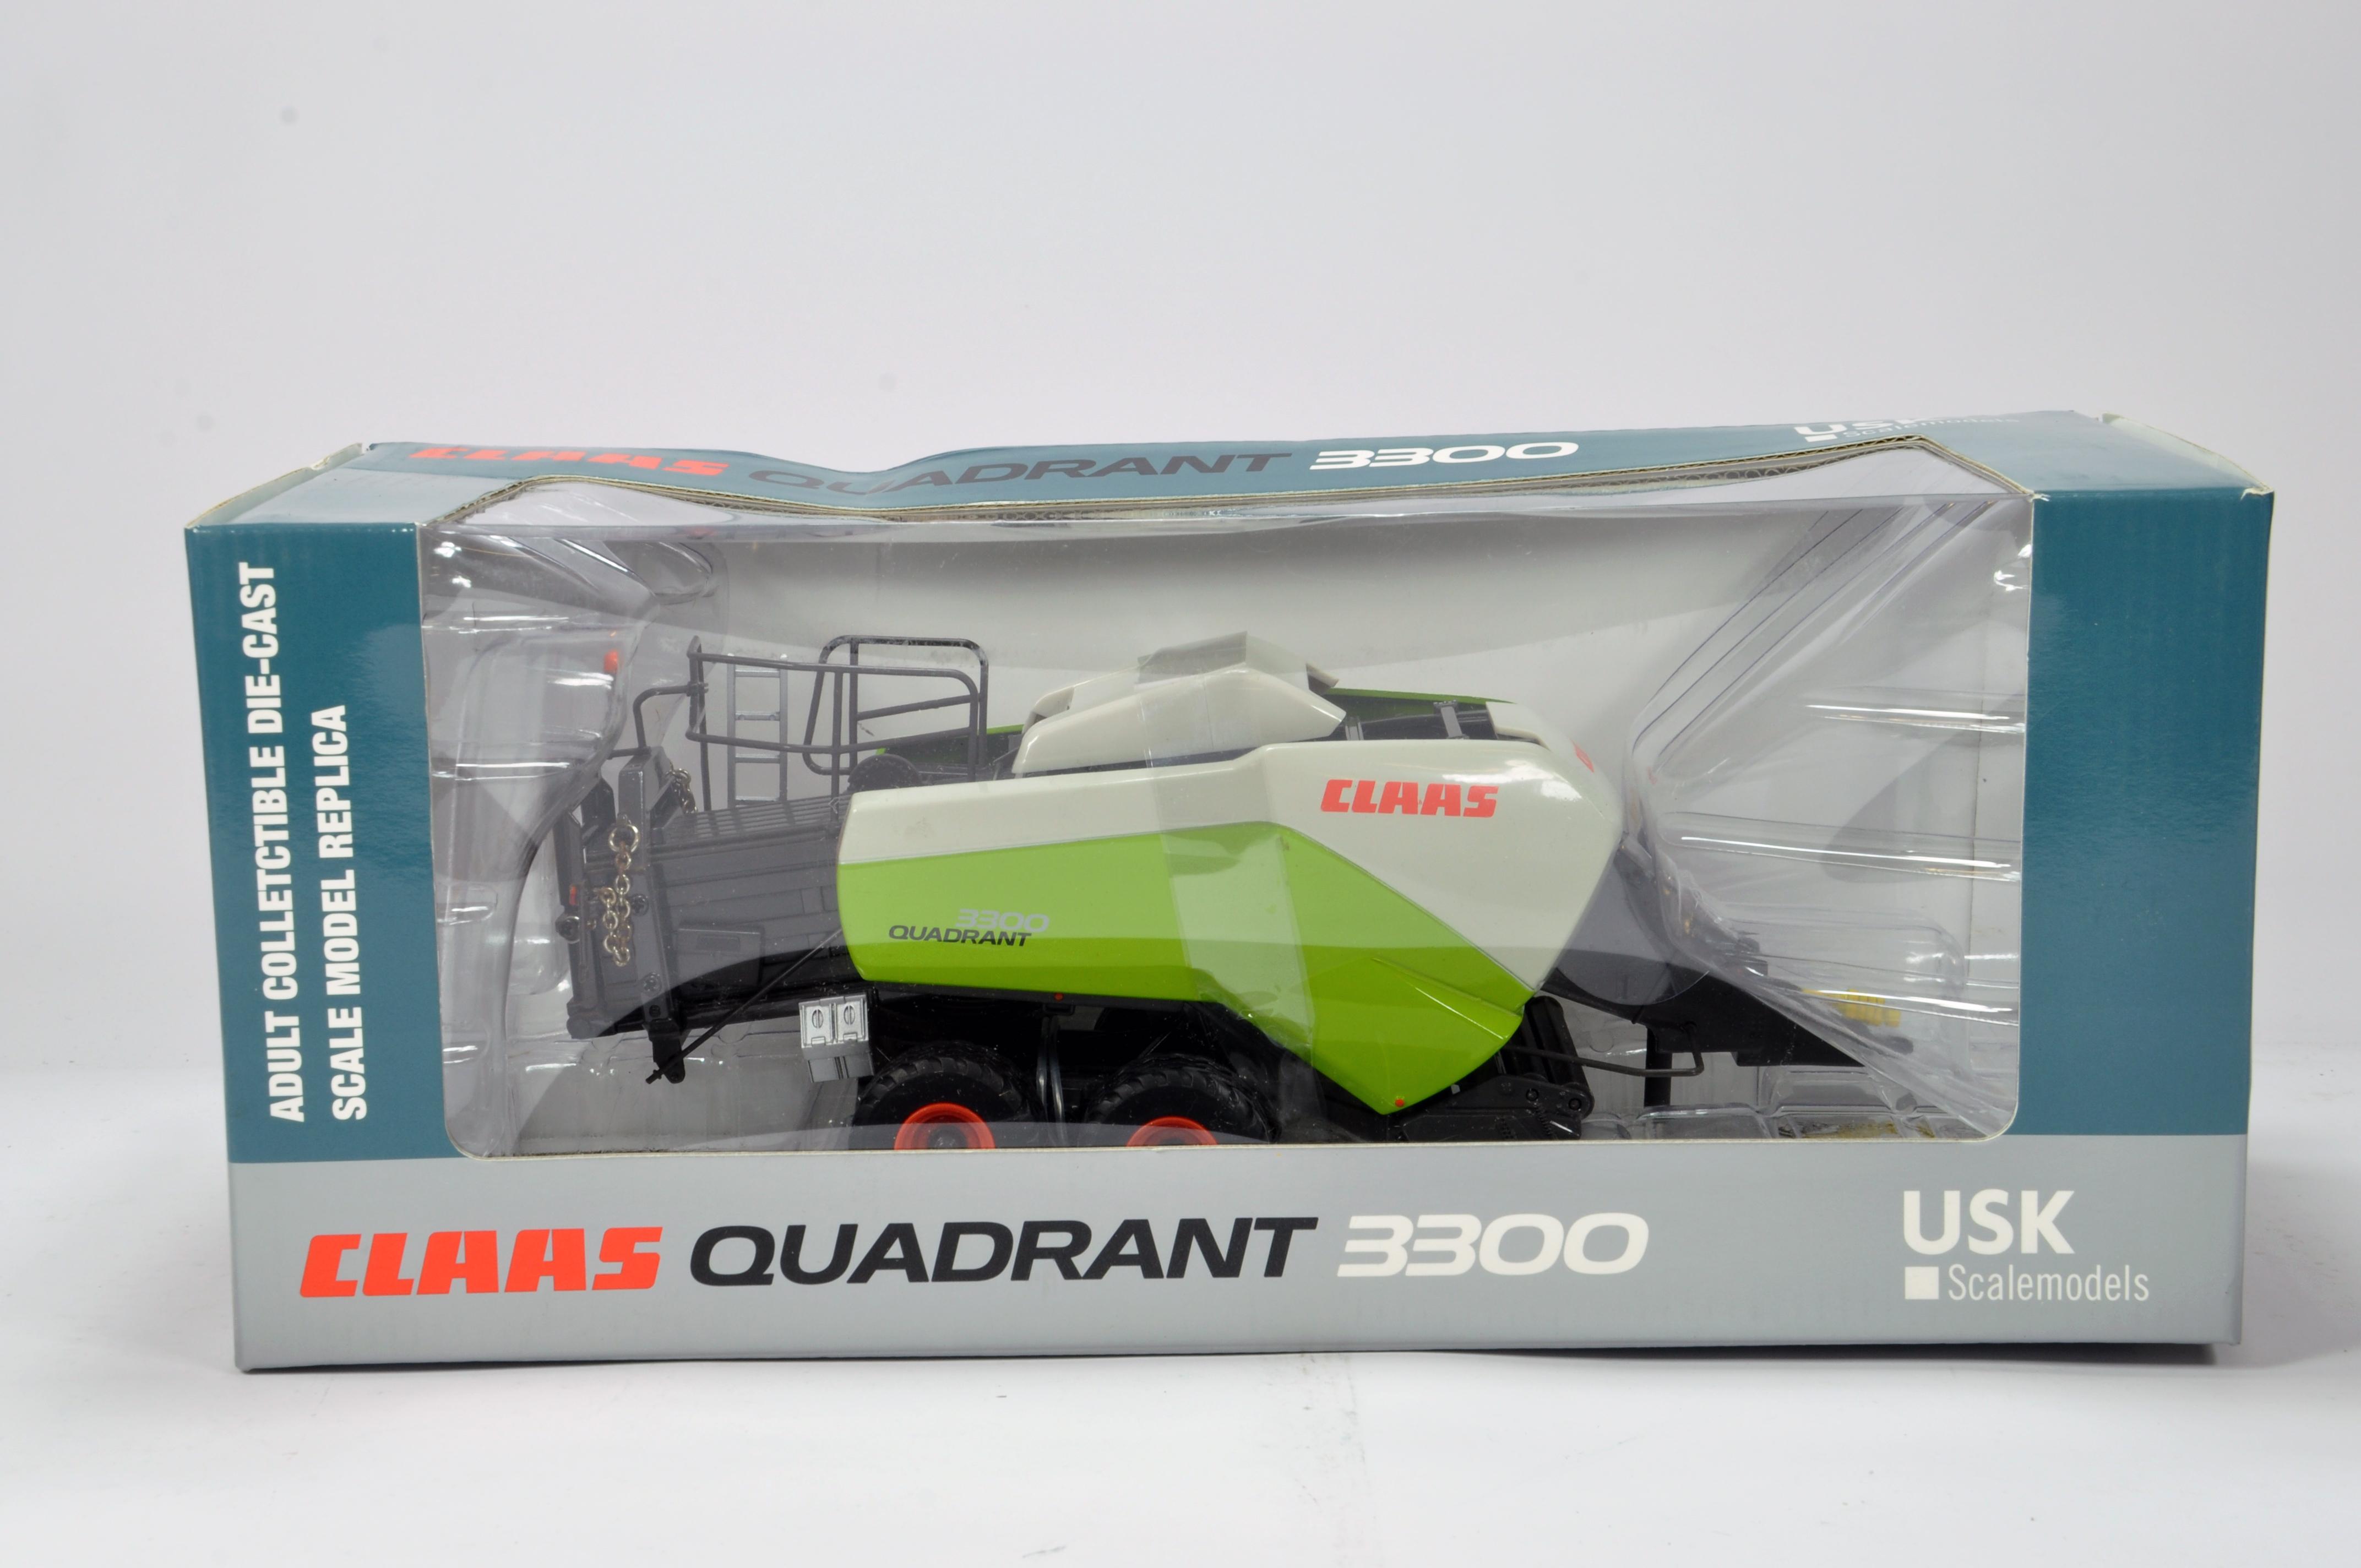 Lot 406 - USK 1/32 Farm Diecast model comprising Claas Quadrant 3300 Baler. NM to M in Box.